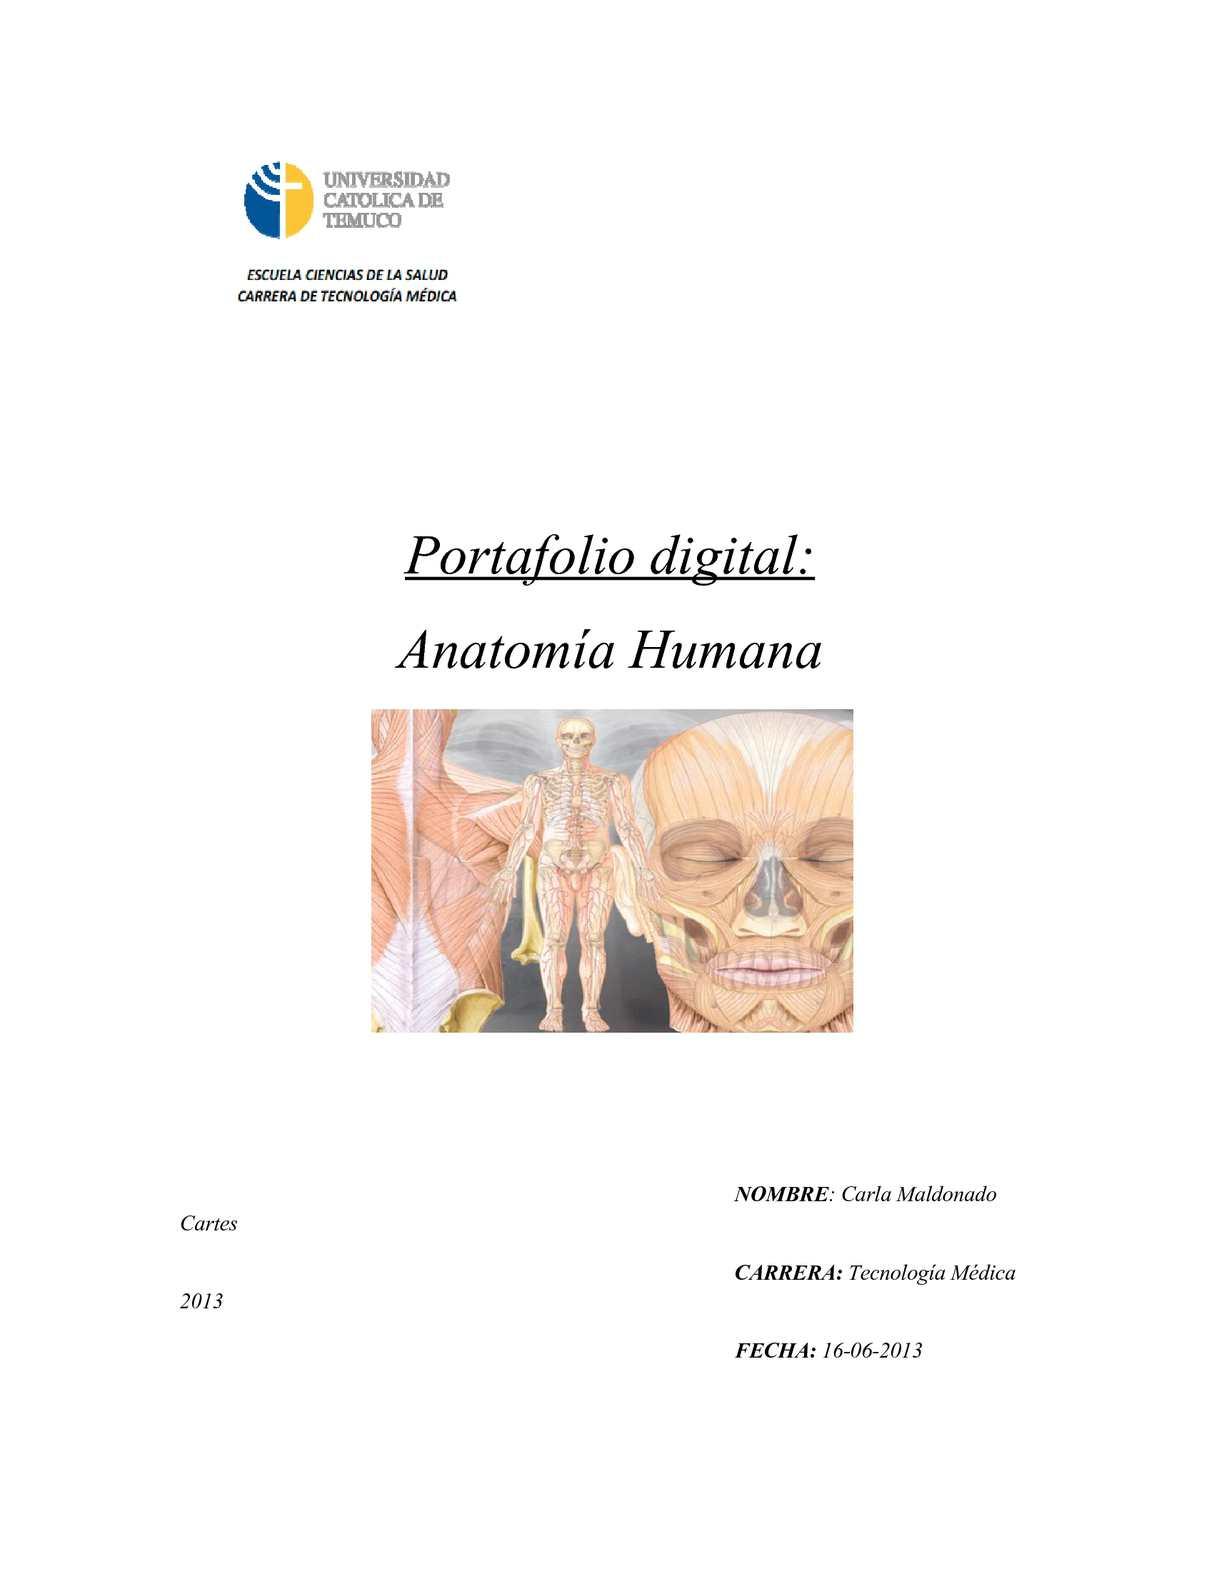 Calaméo - Portafolio Digital Anatomía Humana - Carla Maldonado Cartes